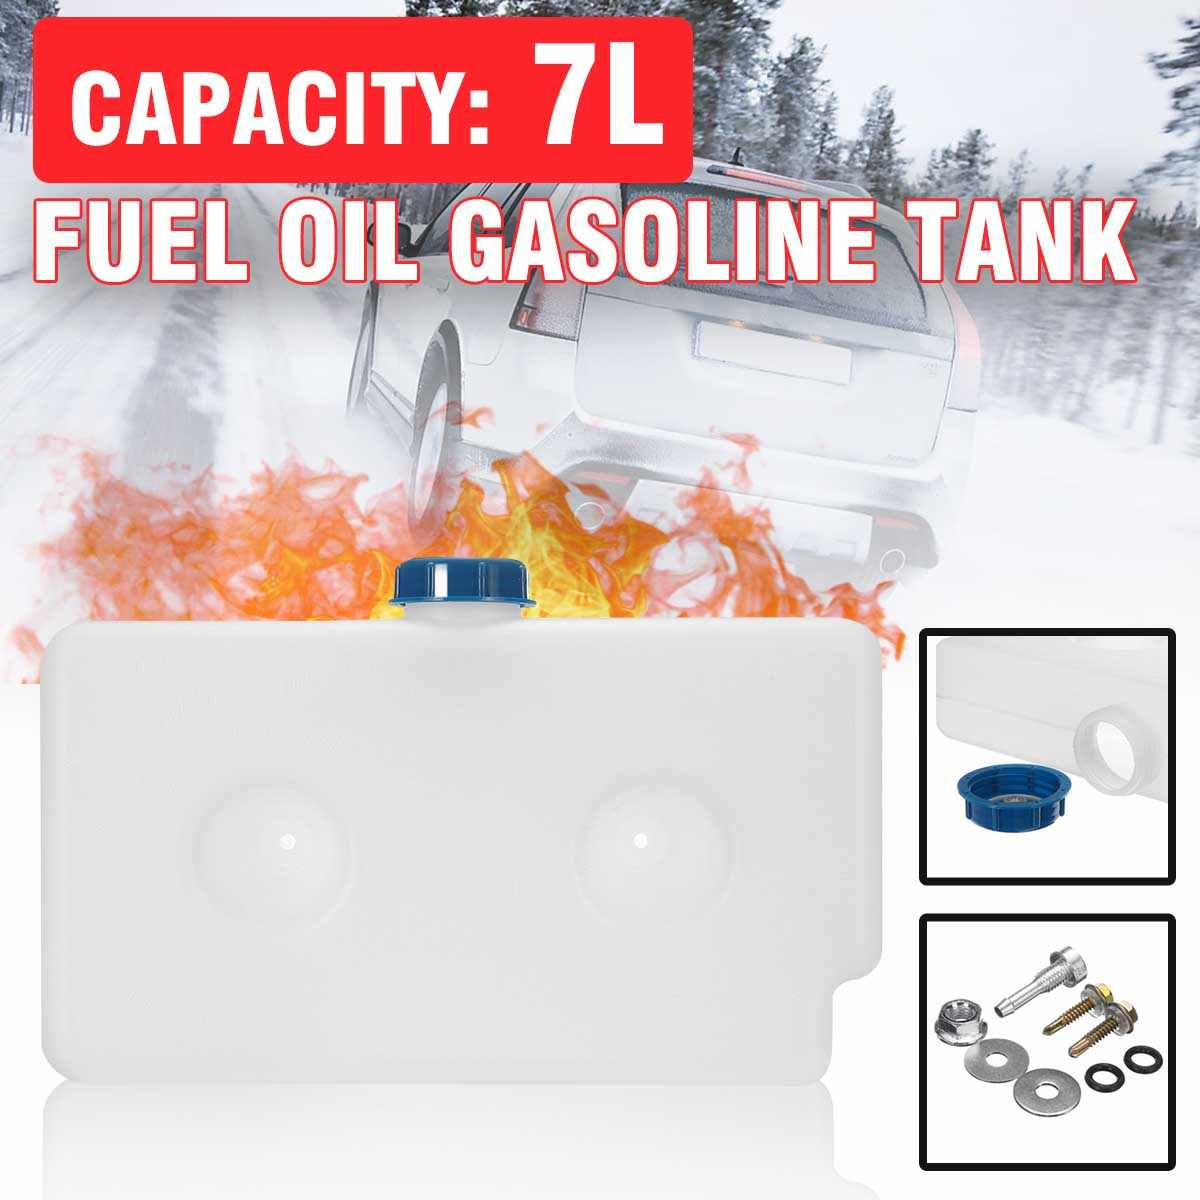 Universal 7l 2 buraco de plástico óleo combustível gasolina tanque aquecedor ar diesel carro caravana motorhome ferramenta aquecedor estacionamento